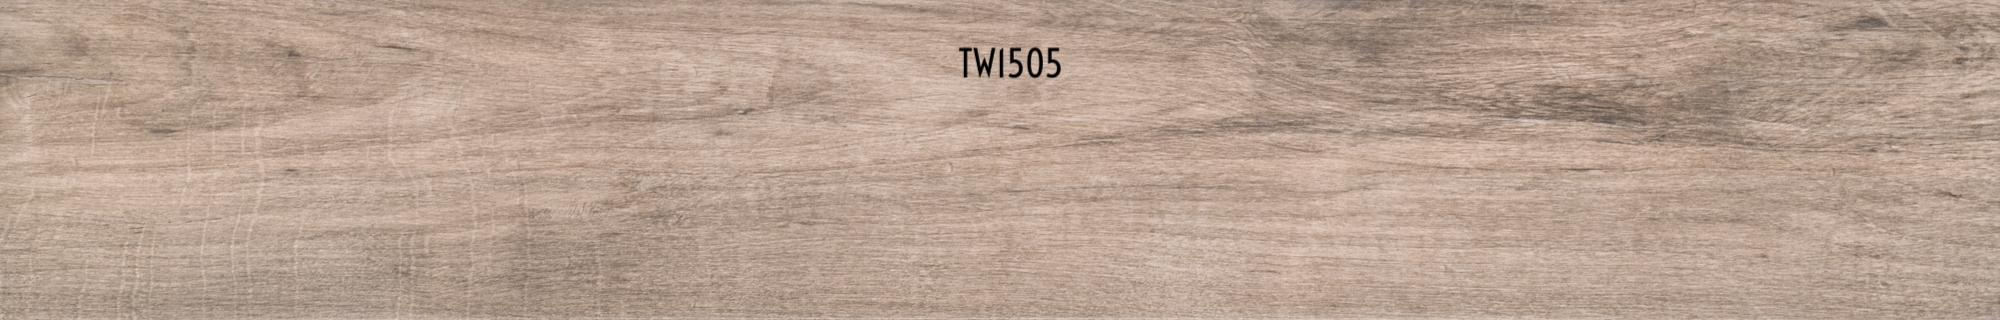 TW1505